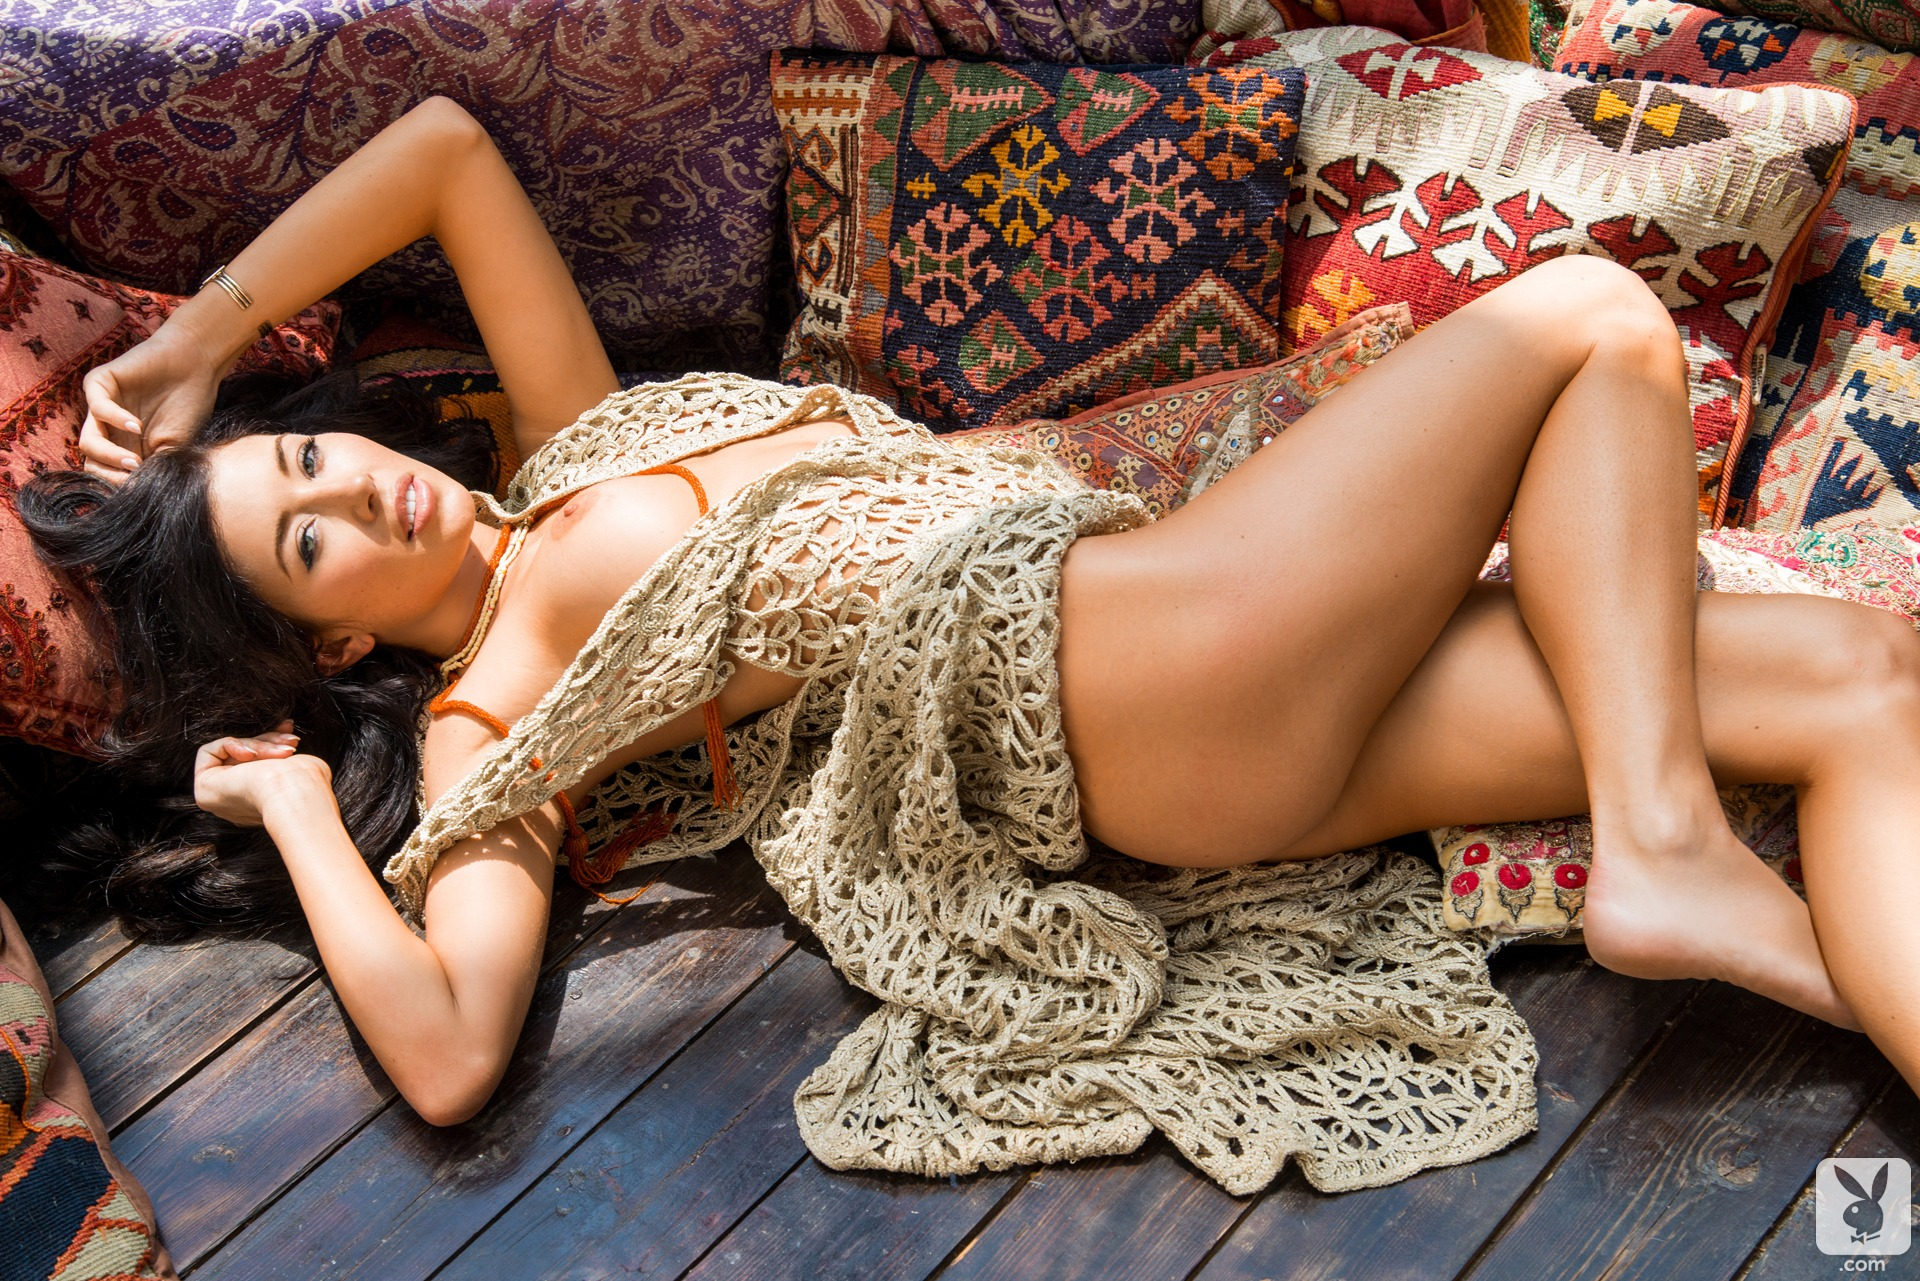 Gemma Lee Farrell Nude Ideal gemma lee farrell nude playboy 11 redbust